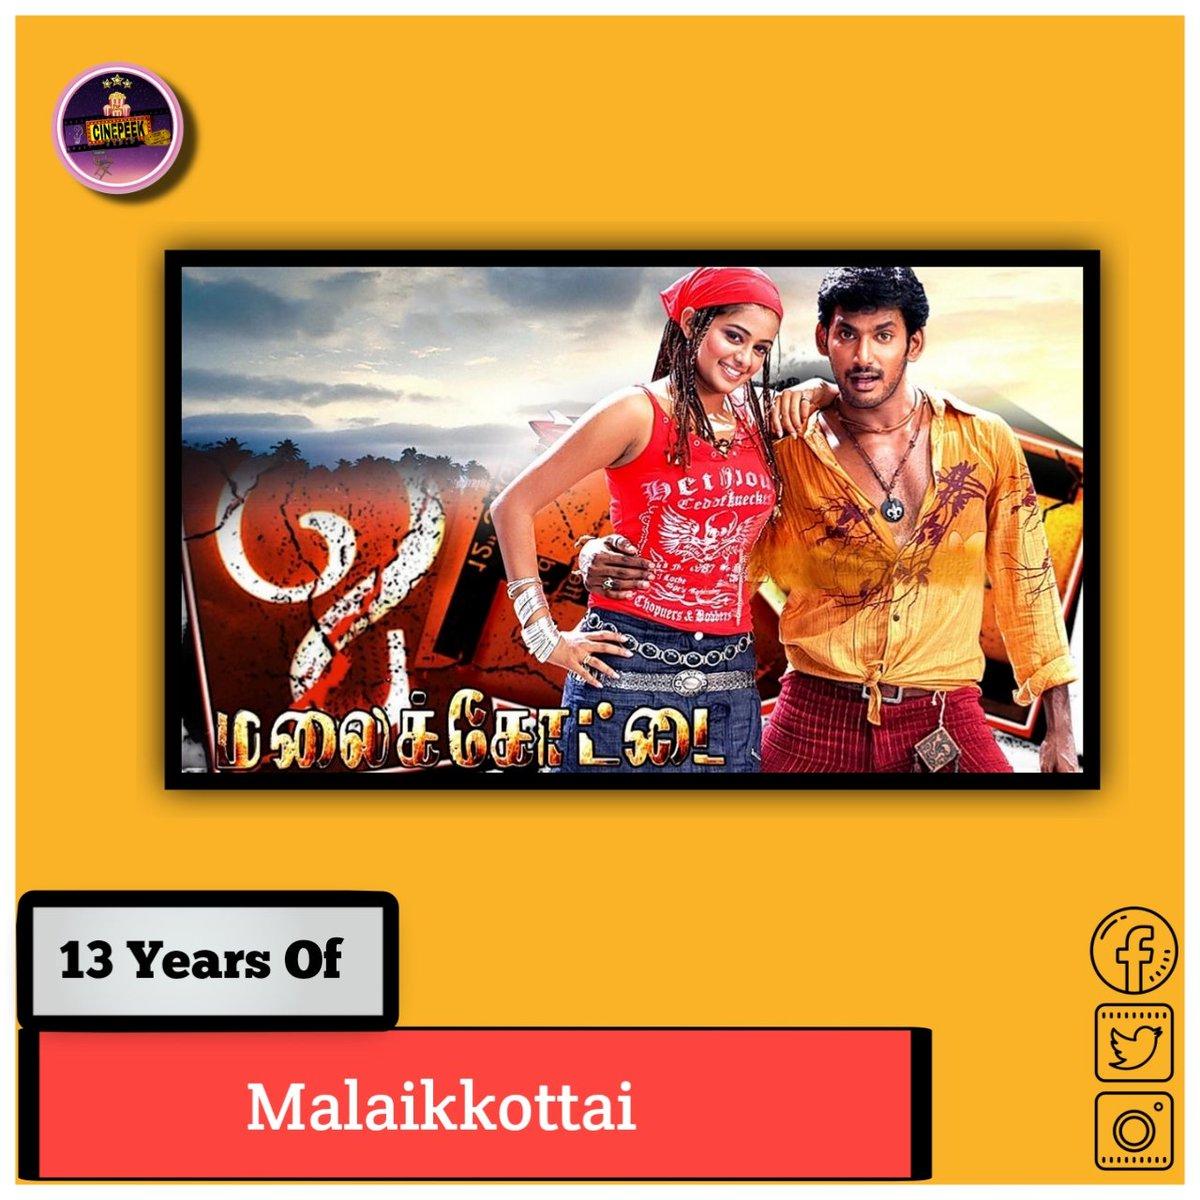 On this Day 🥳 13 Years Ago #Malaikottai Movie Release 💥  #13YearsOfMalaikottai  @VishalKOfficial @priyamani6 #CinePeek https://t.co/cUZWl3PM7K